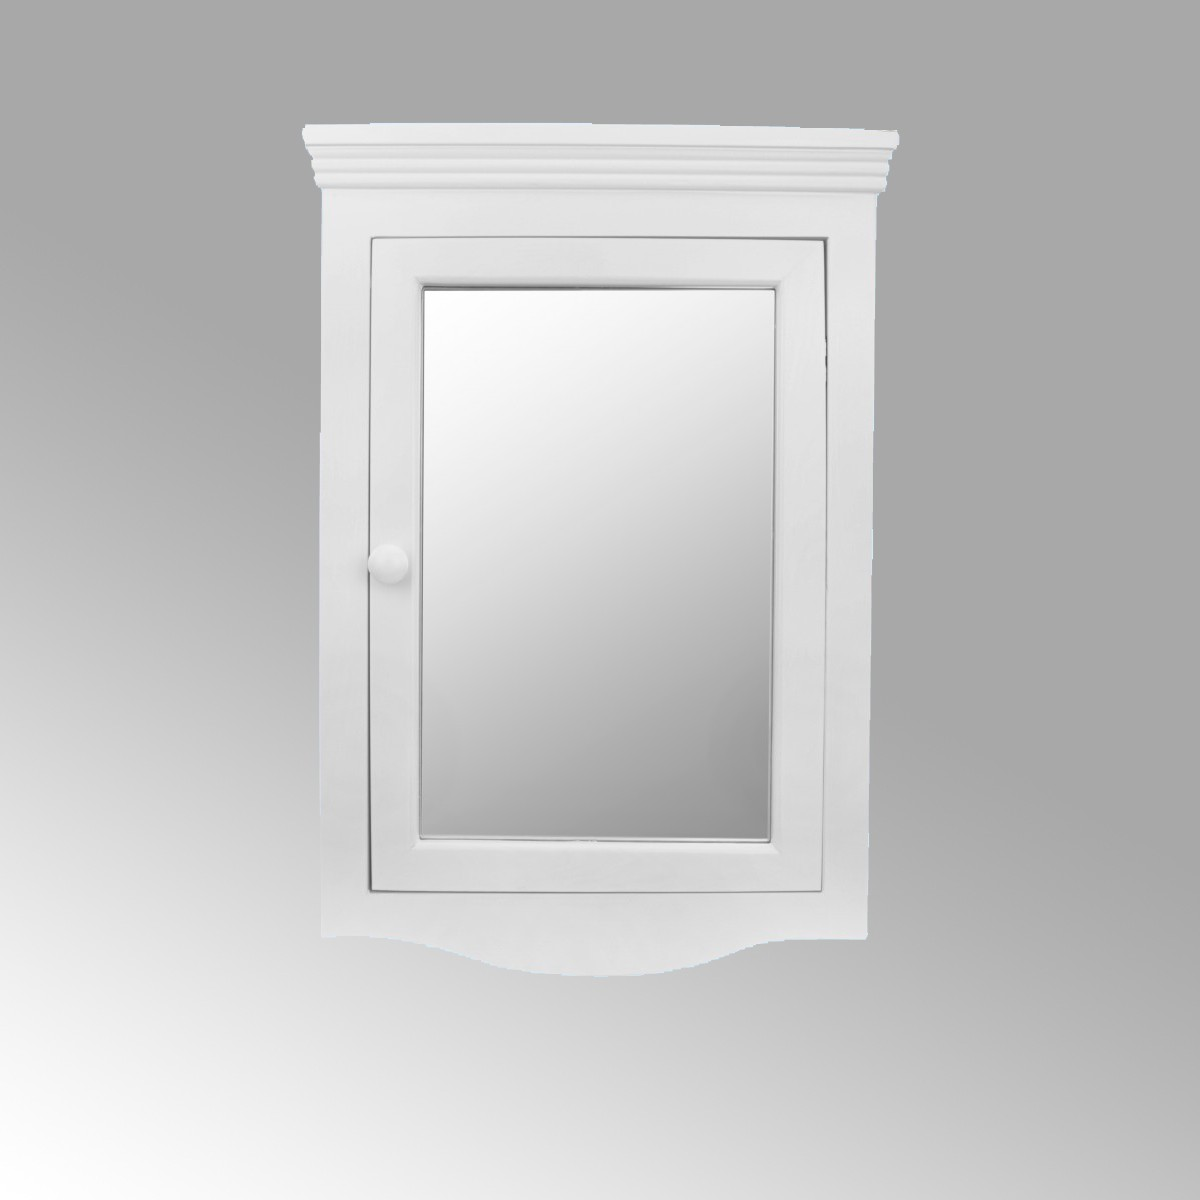 White Bathroom Wall Mount Medicine Cabinet Mirrored Door Fully Pre ...